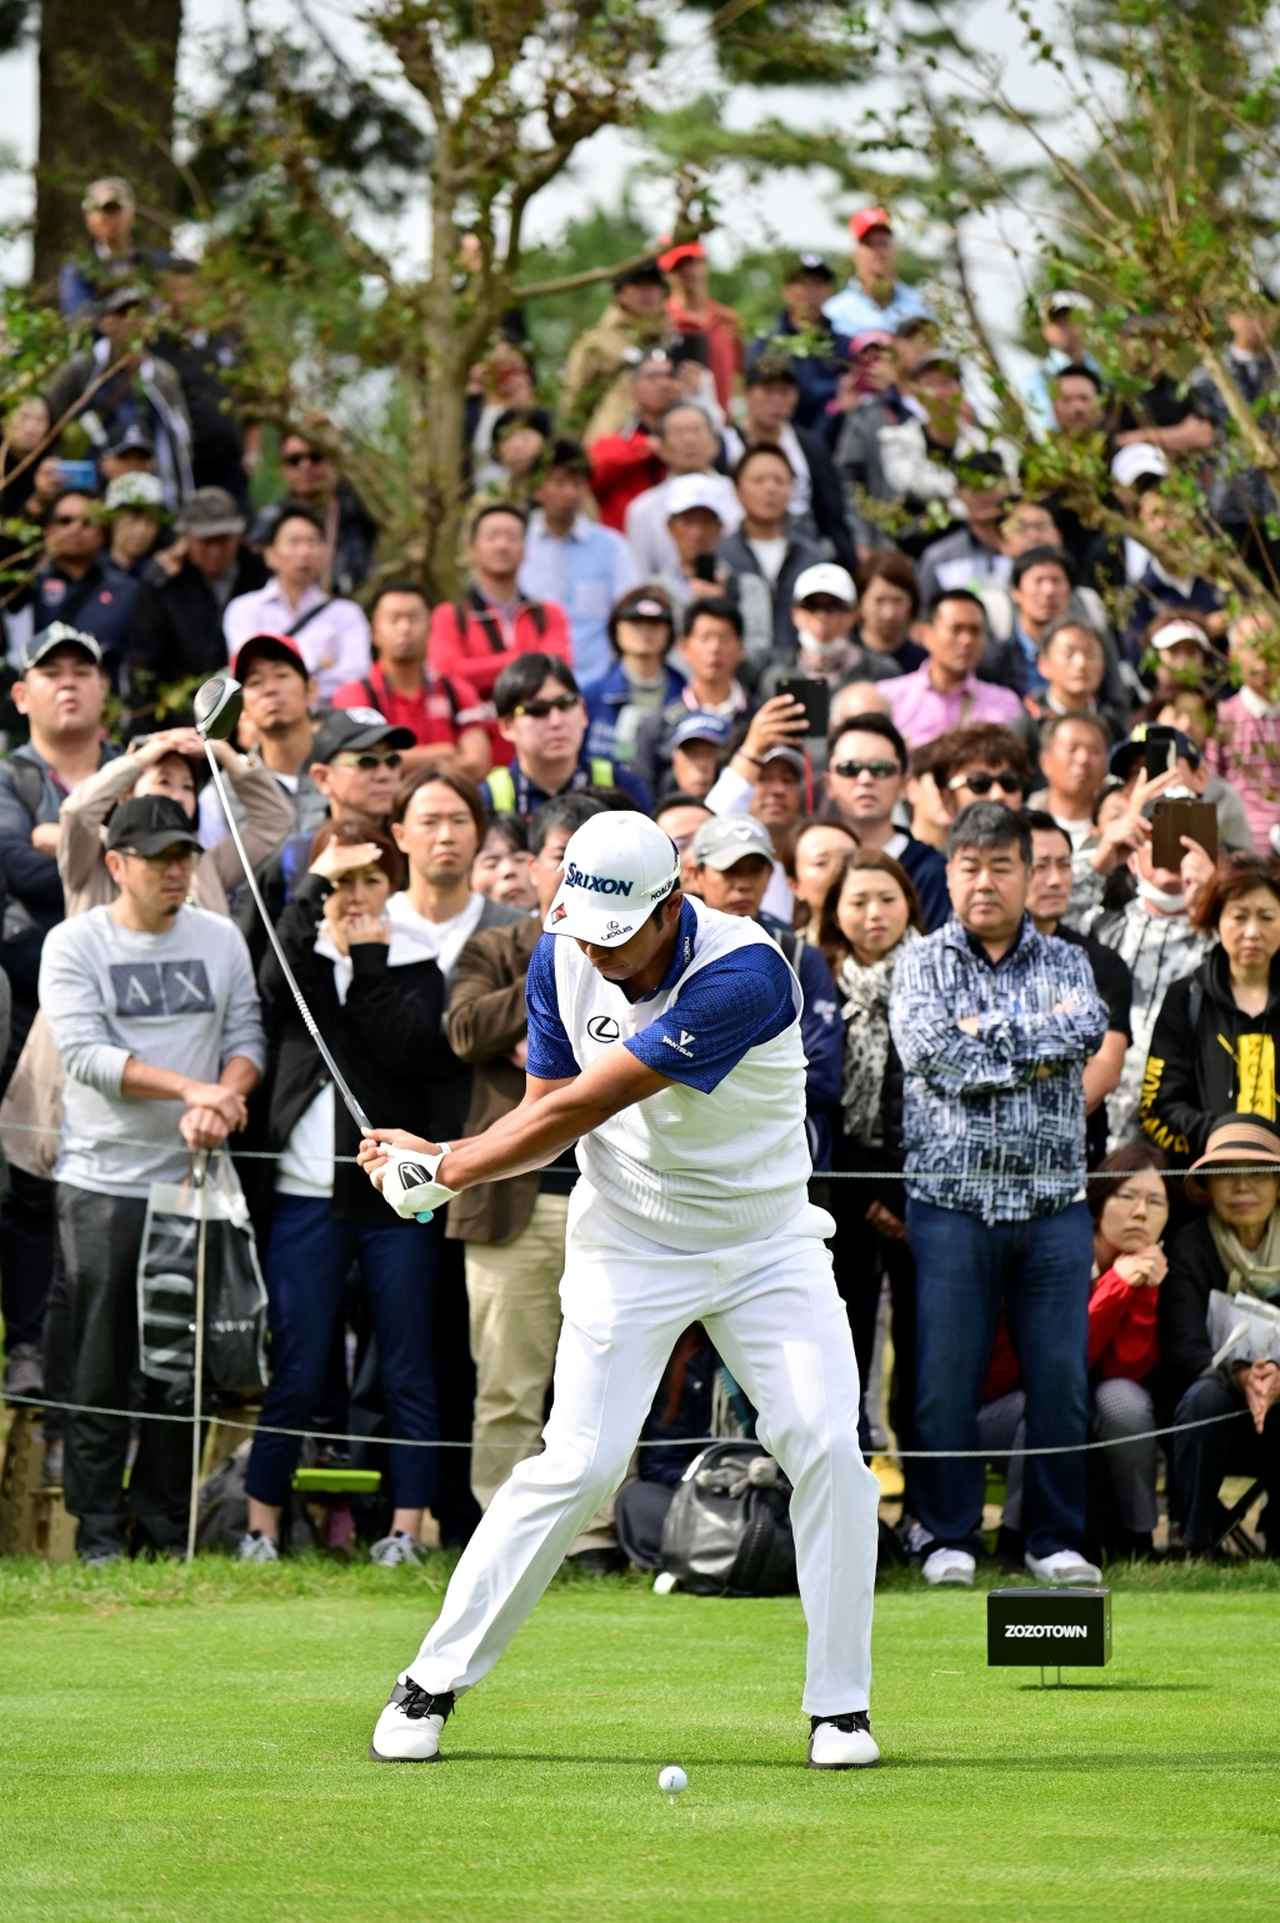 Images : 6番目の画像 - 松山英樹のドライバー連続写真 - みんなのゴルフダイジェスト